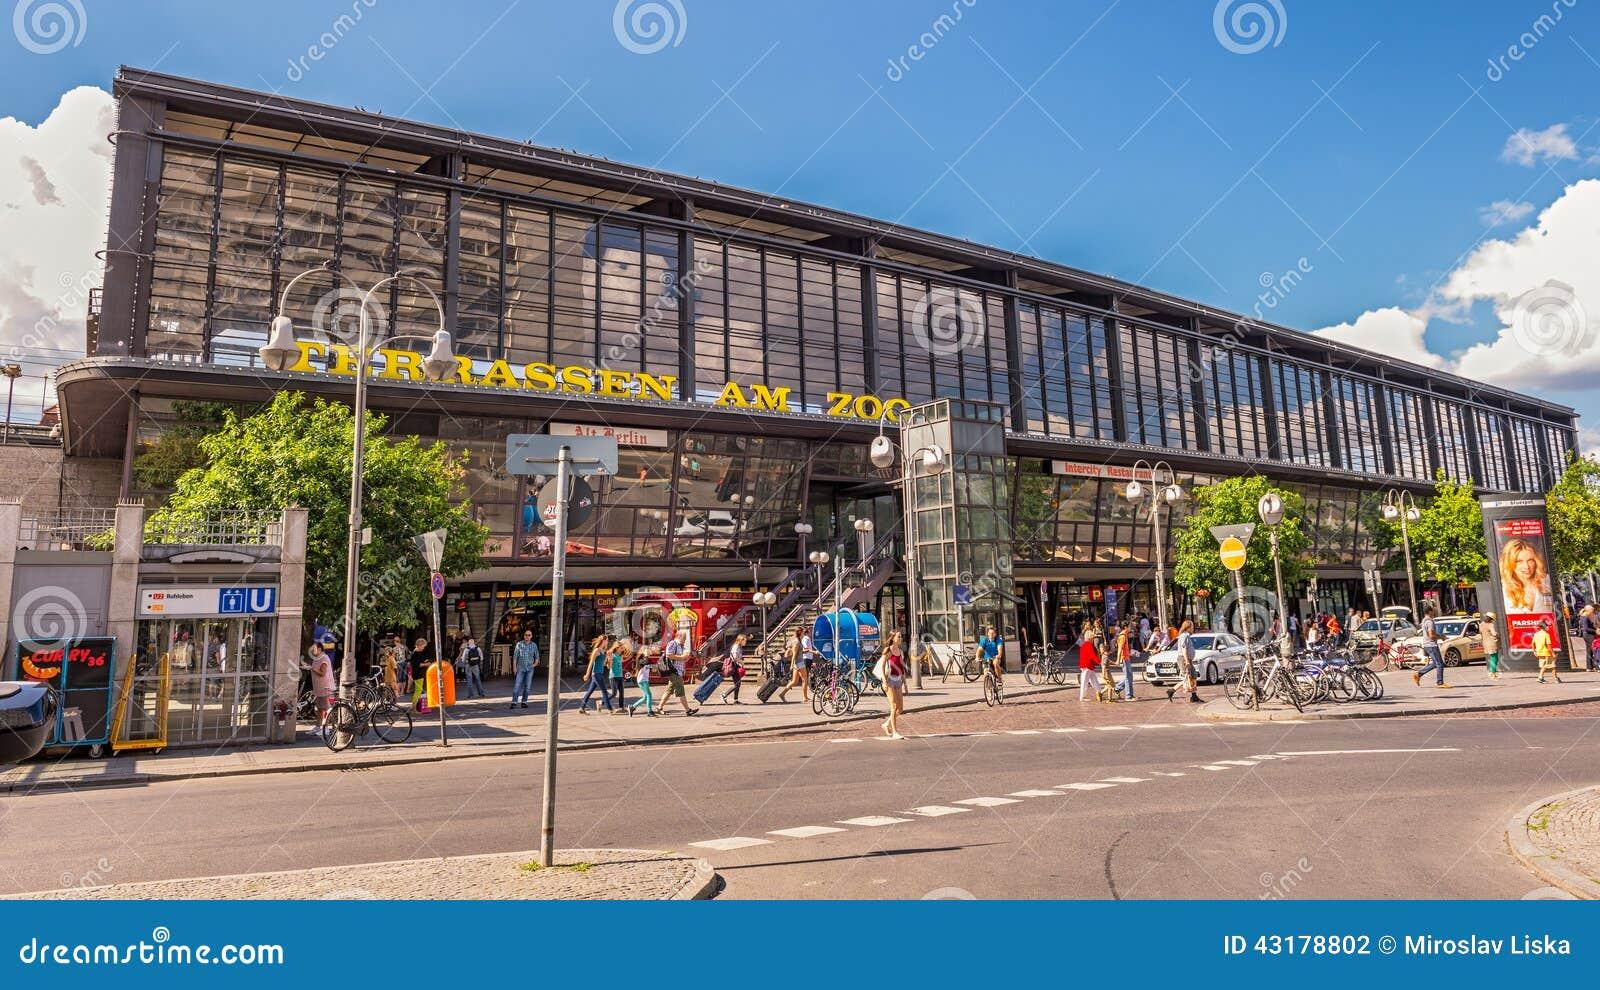 Berlin Zoologischer Garten Railway Station Editorial Photography